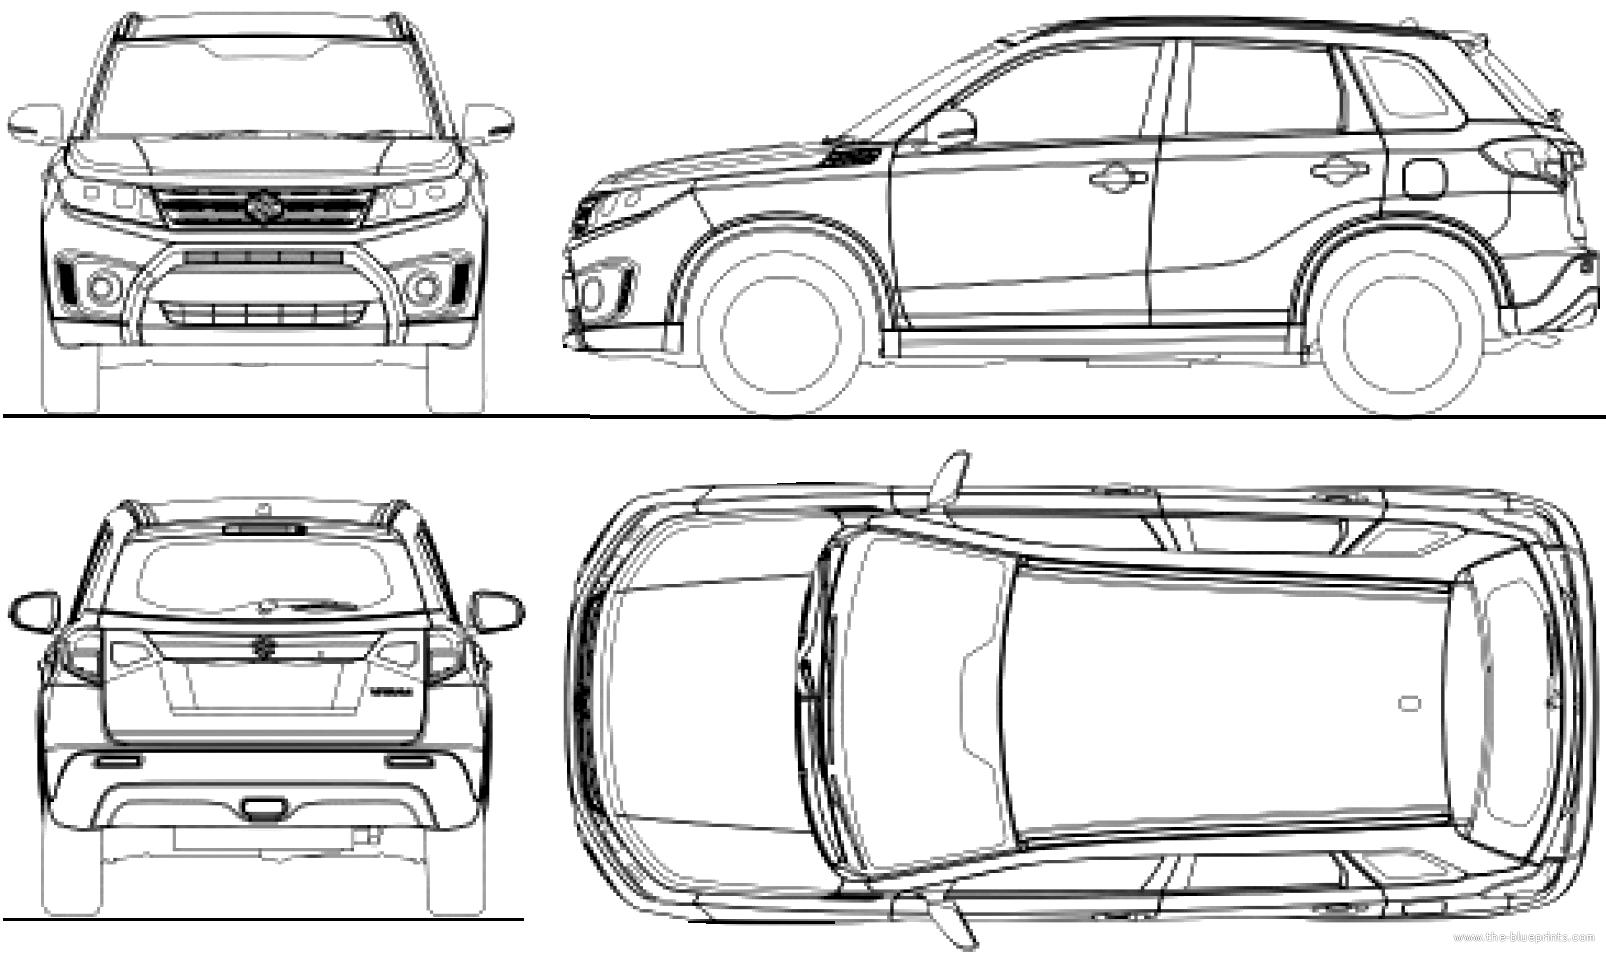 Suzuki Vitara Dimensions